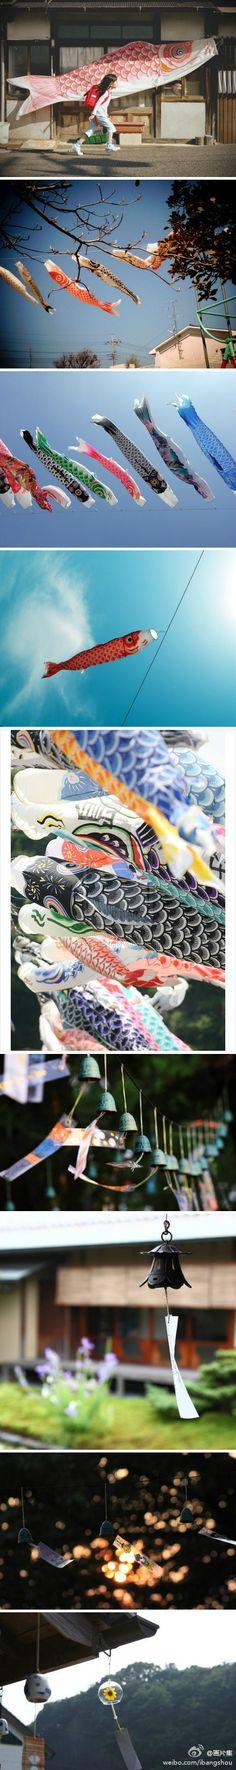 "Koinobori, meaning ""carp streamer"" in Japanese, are carp-shaped wind socks traditionally flown in Japan to celebrate Children's Day."